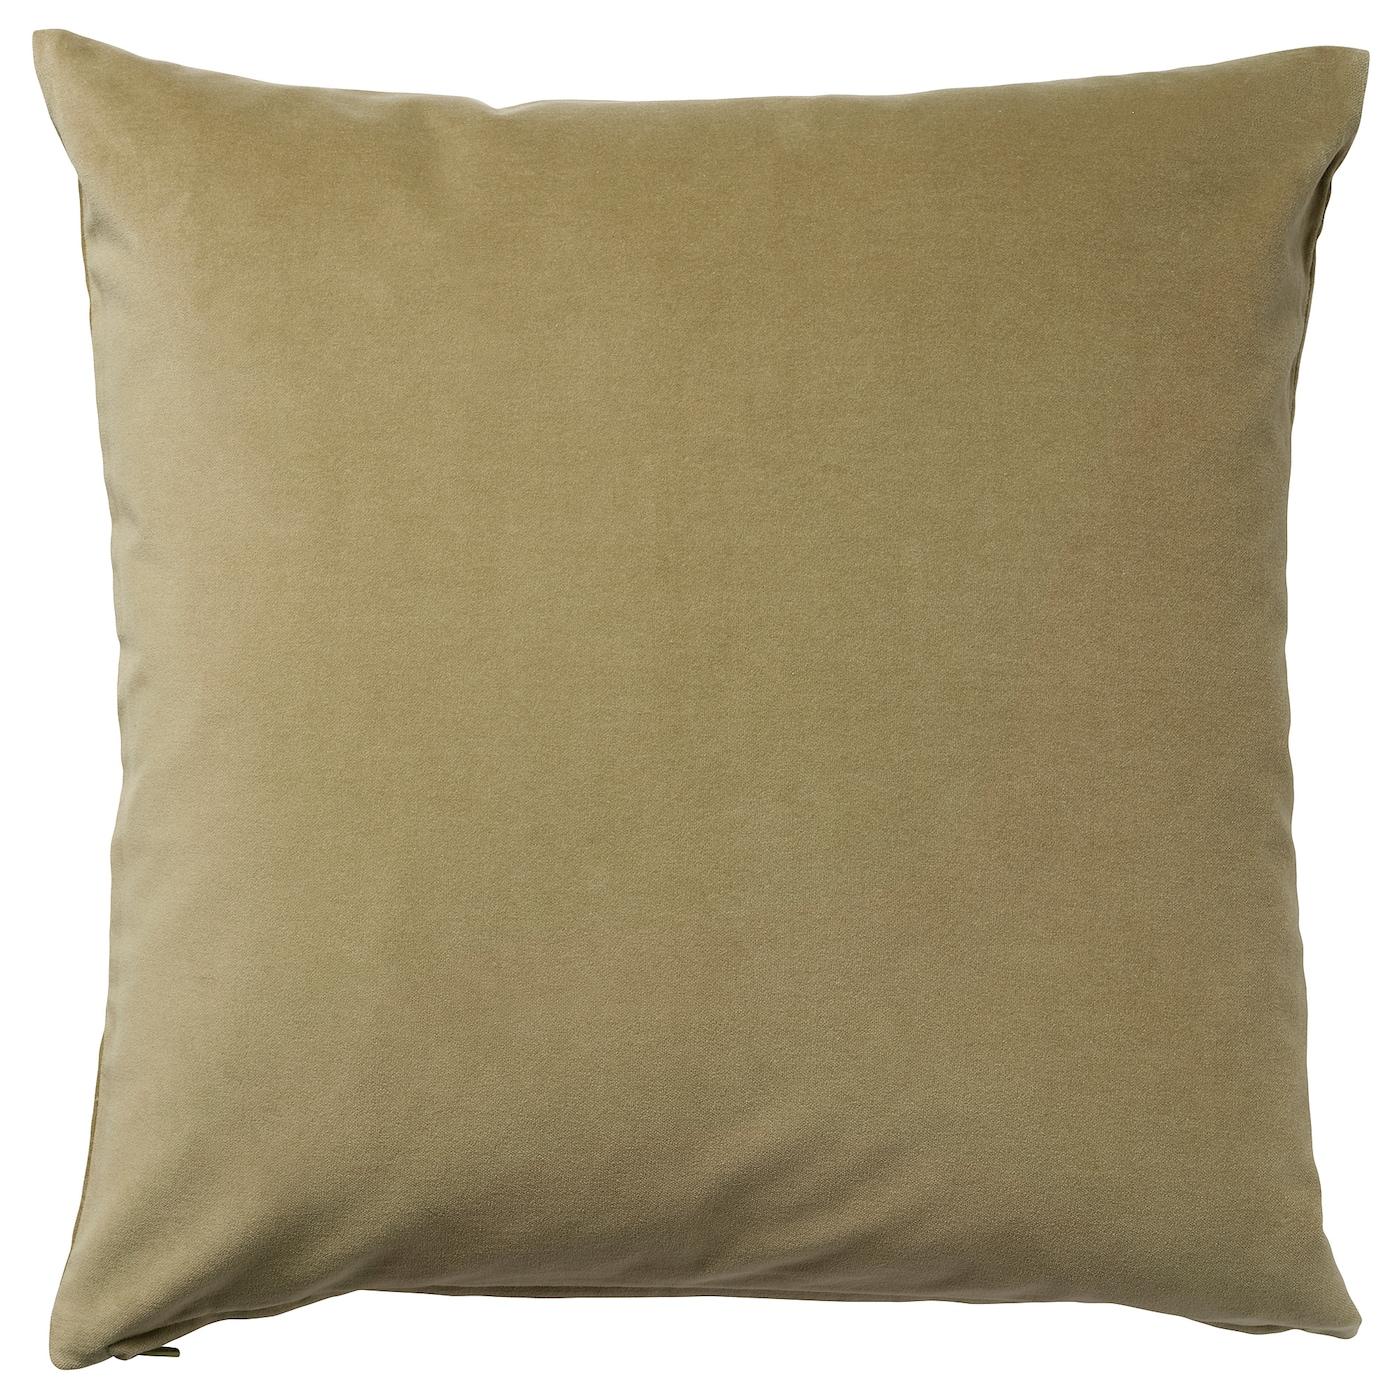 Sanela Cushion Cover Light Olive Green Length 26 Width 26 Ikea